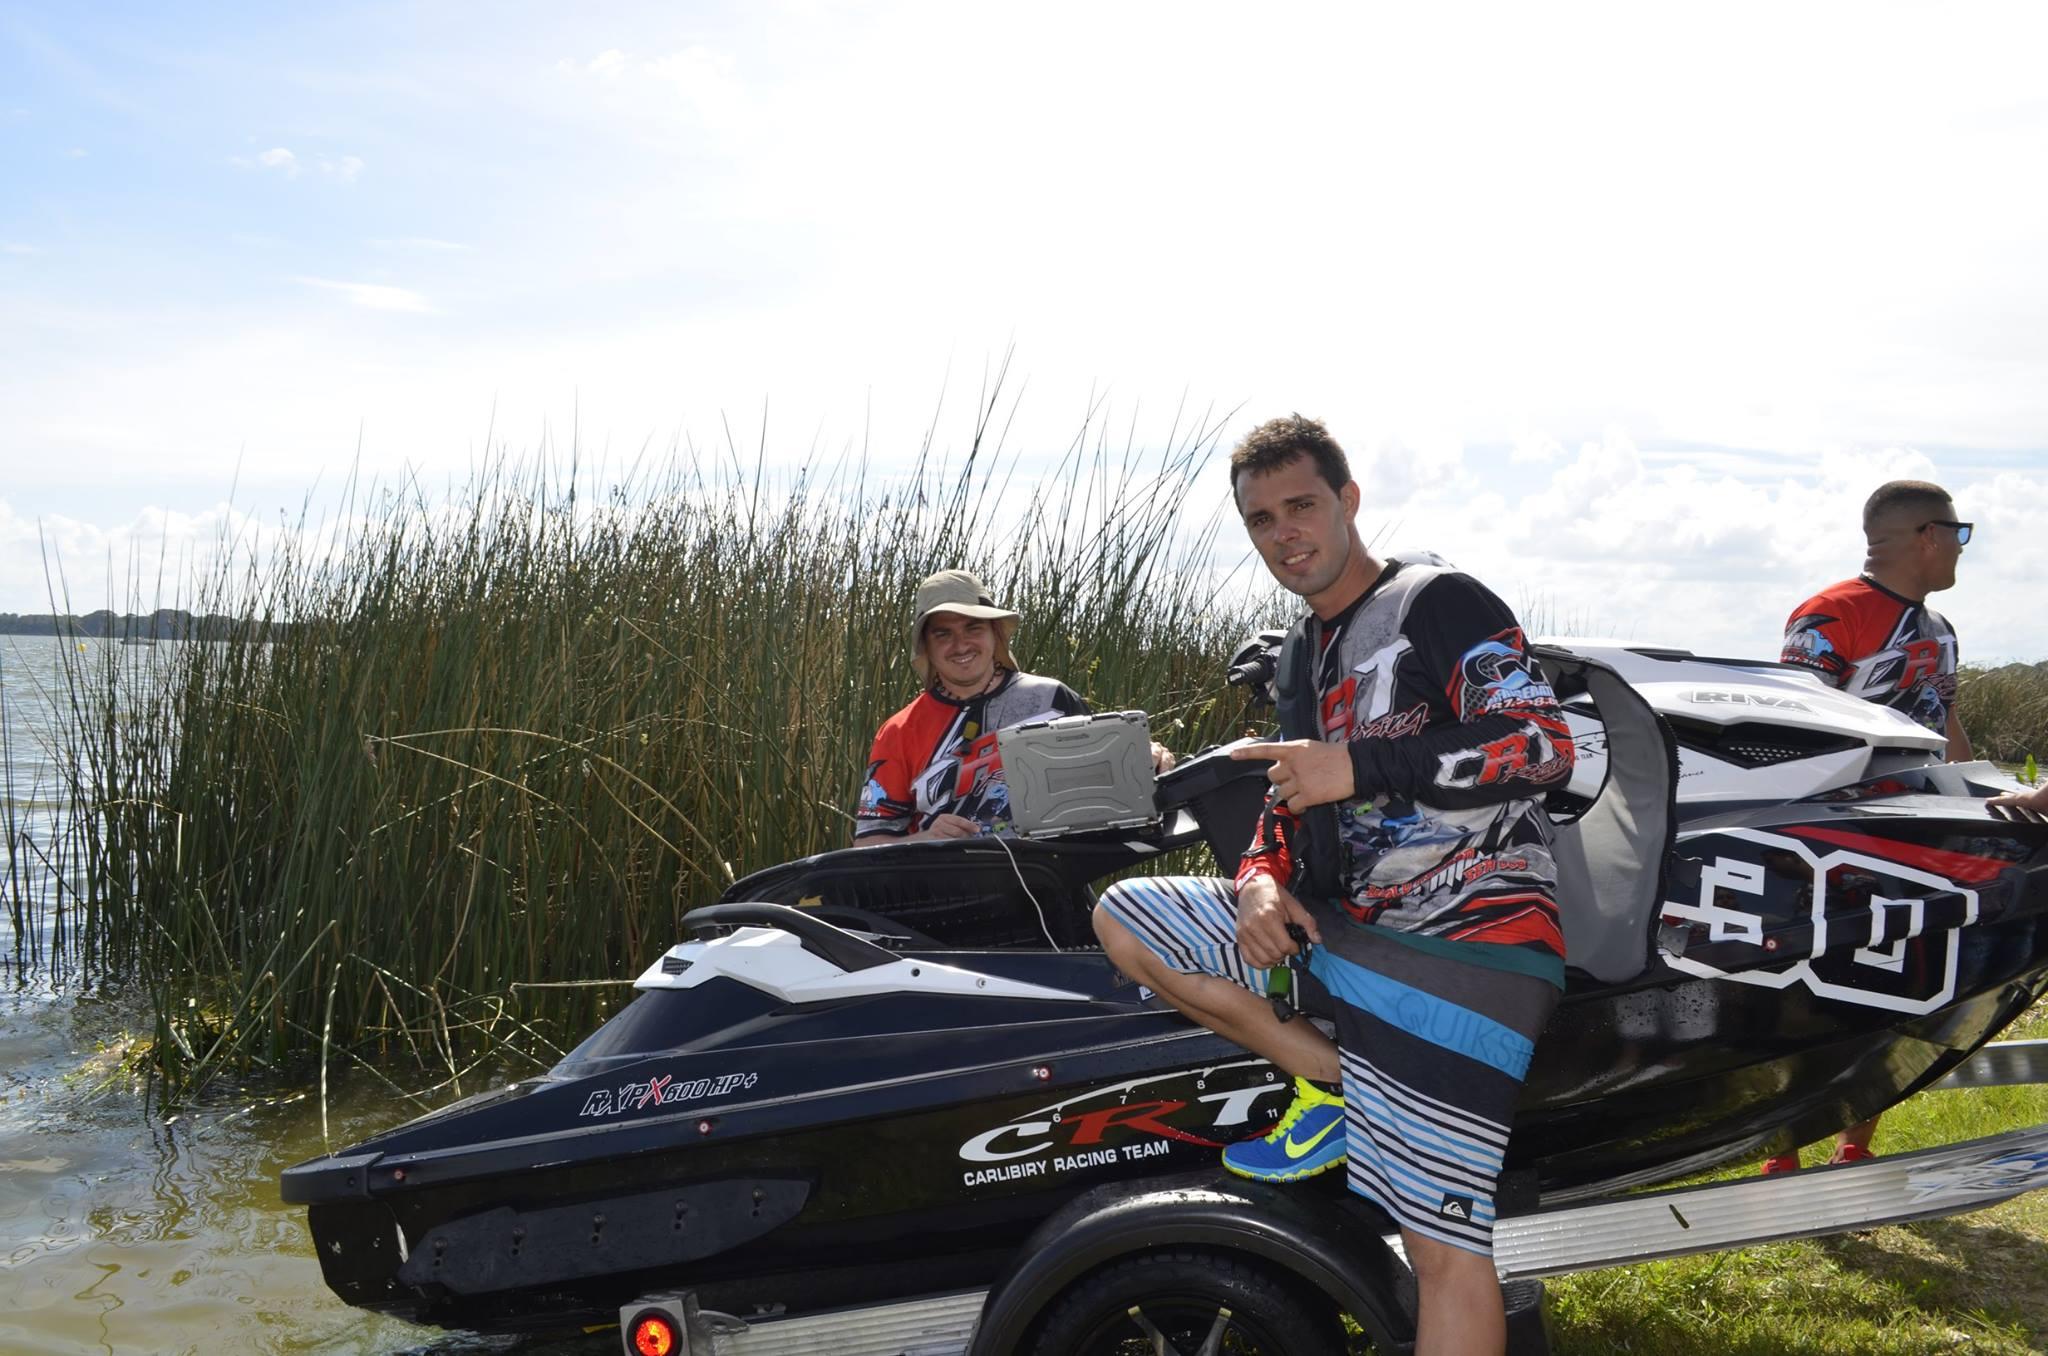 RIVA RACING HydroDrag World Championship Results